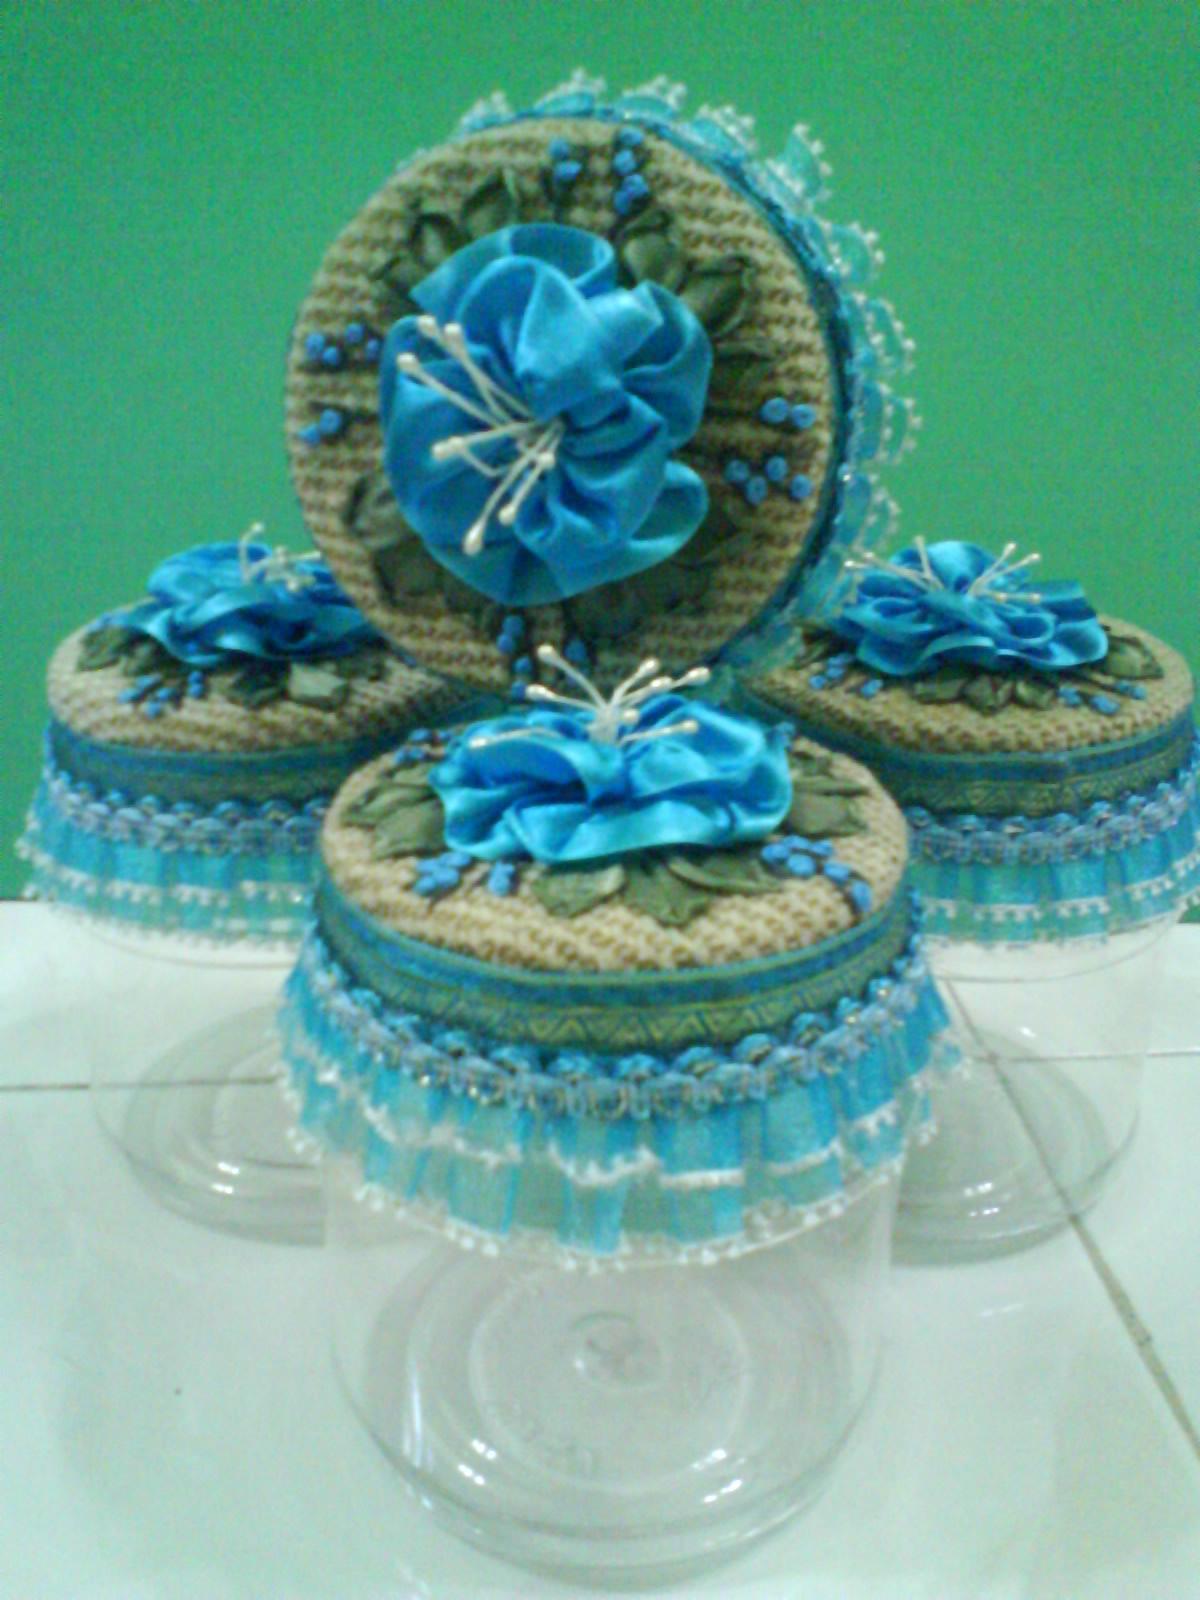 sewing n crafting: Bekas kuih berhias bunga reben